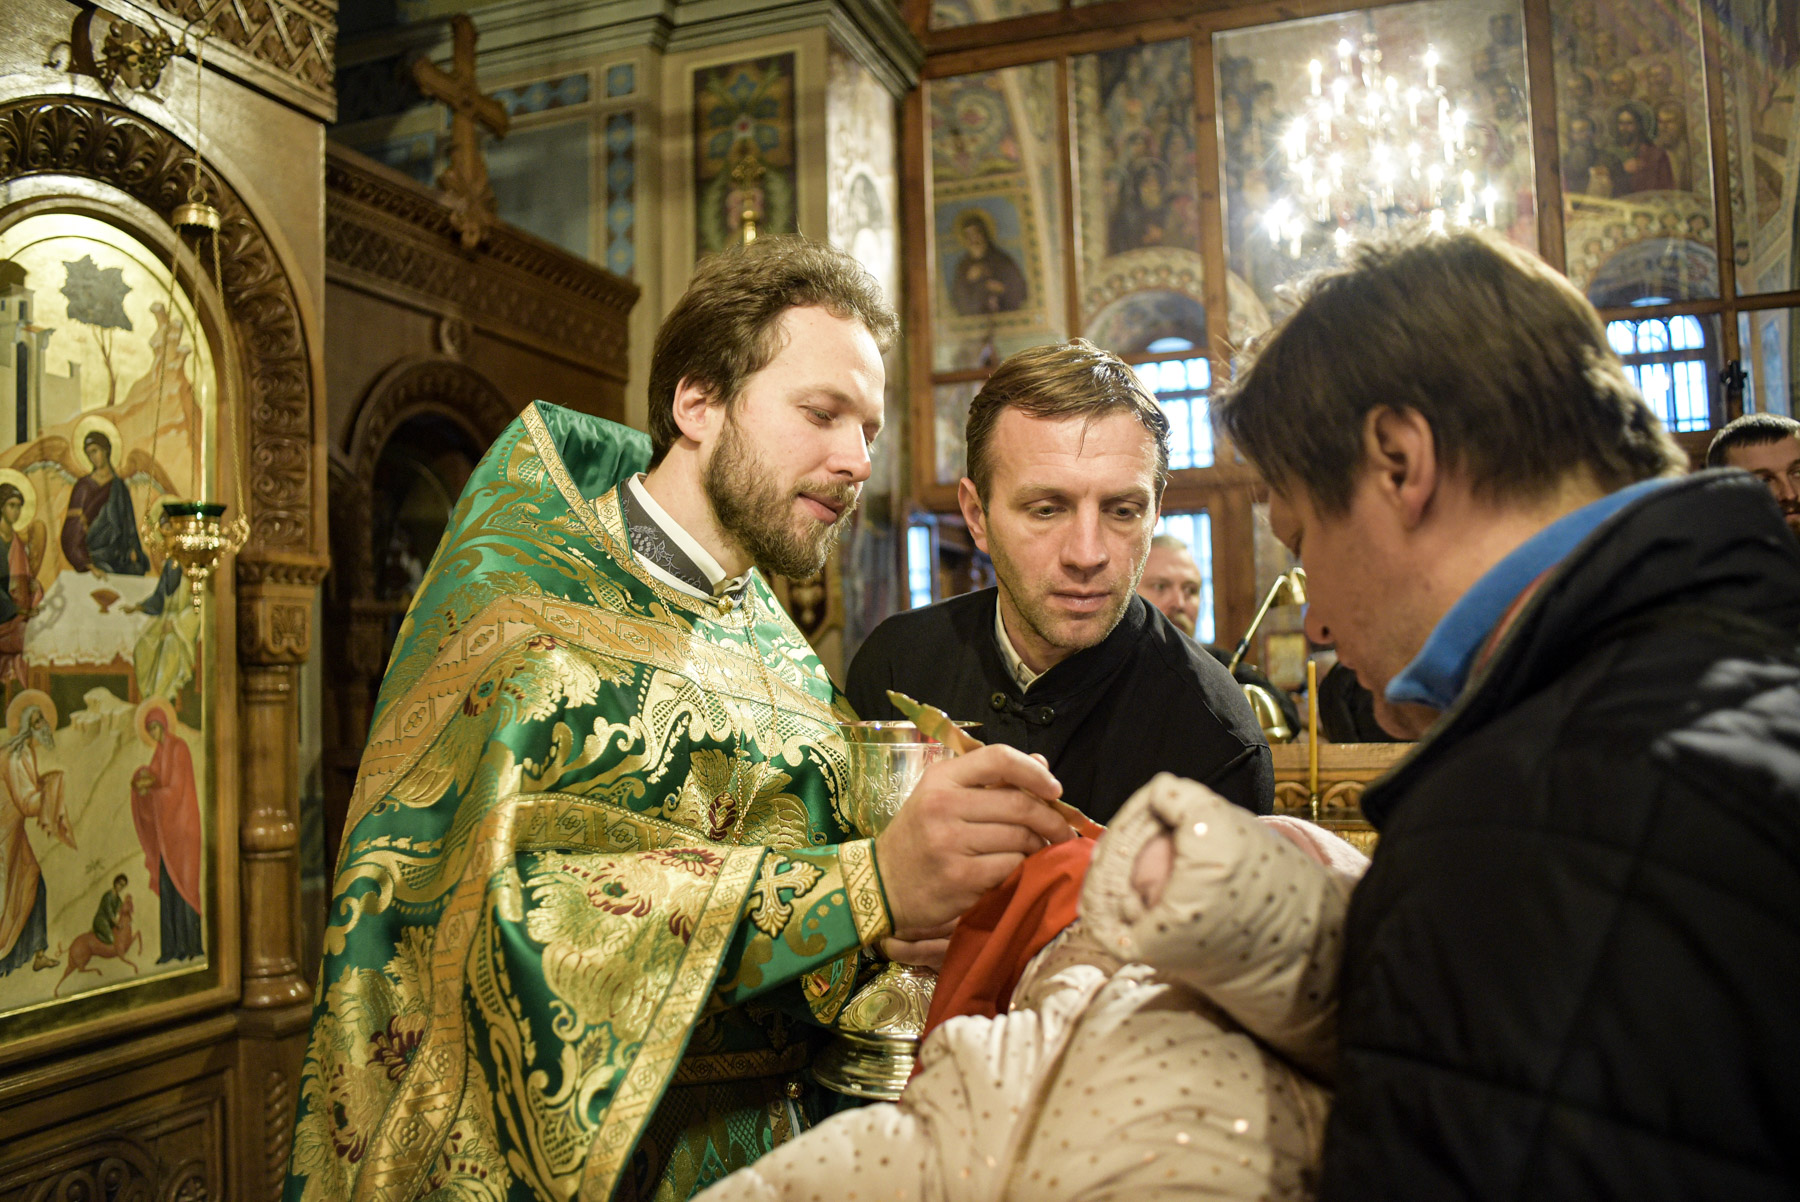 photos of orthodox christmas 0247 1